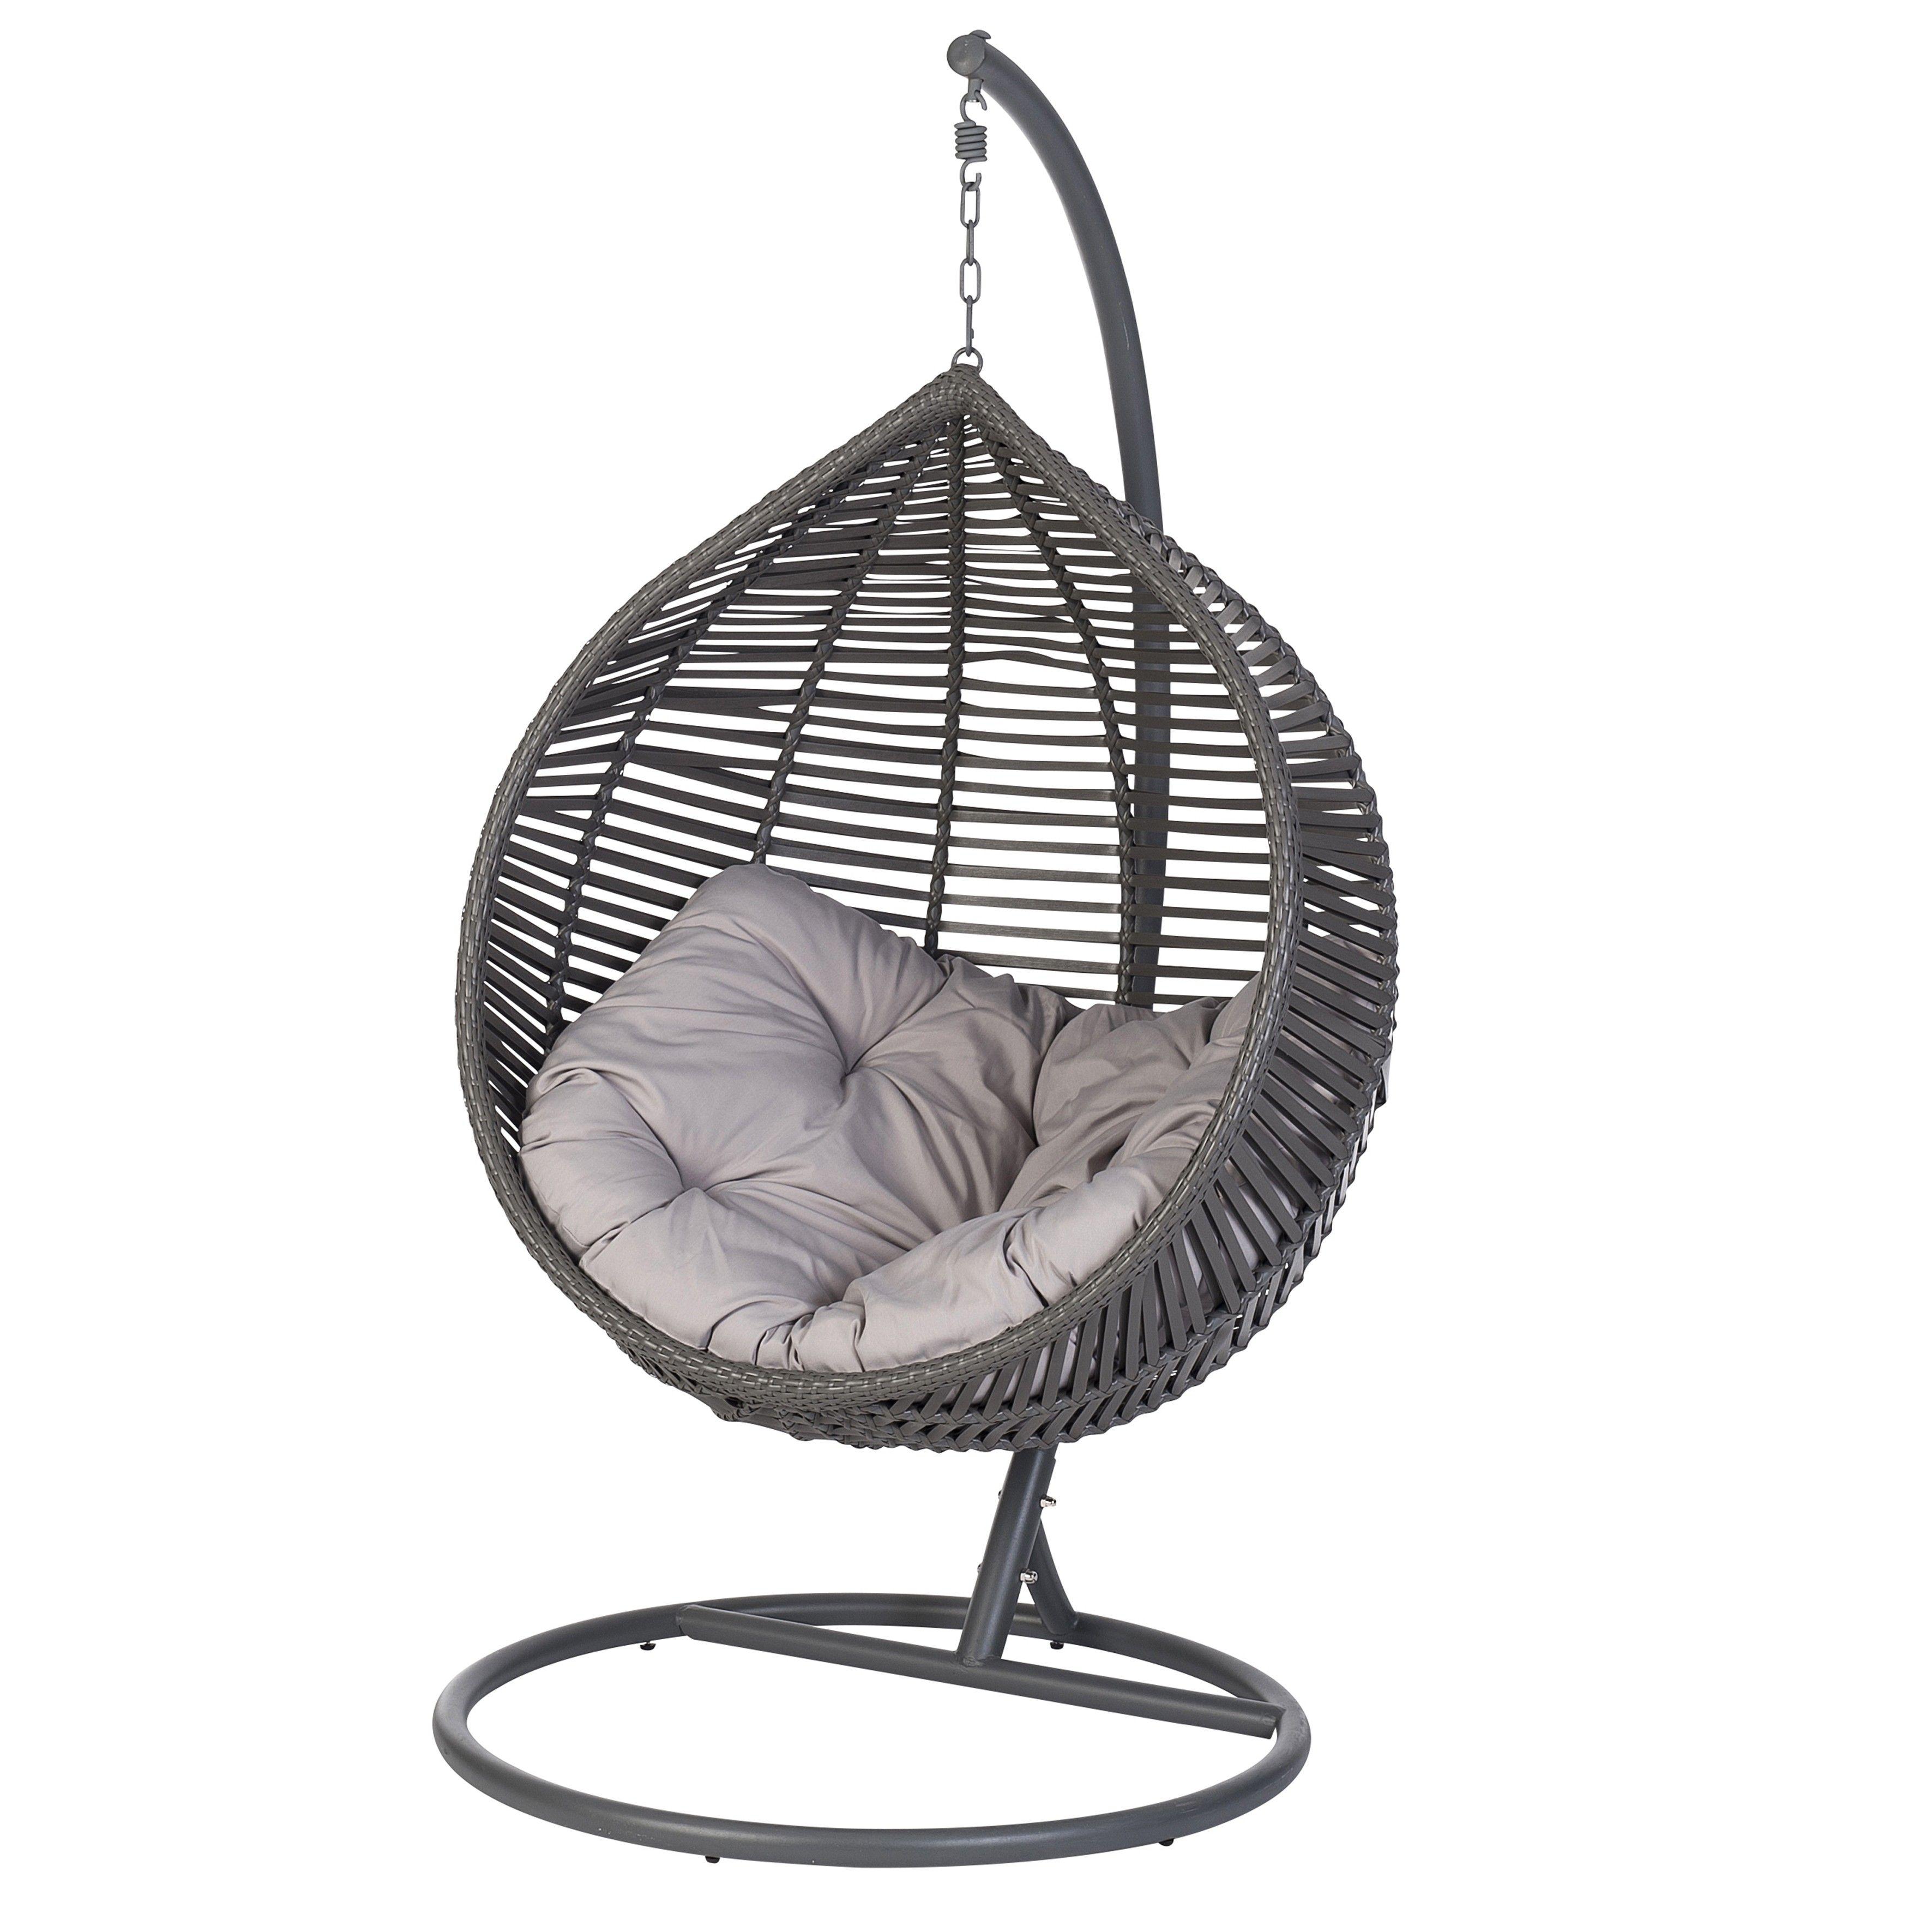 Standaard Egg Chair.Intratuin Hangei Met Streep In Standaard Tuin In 2019